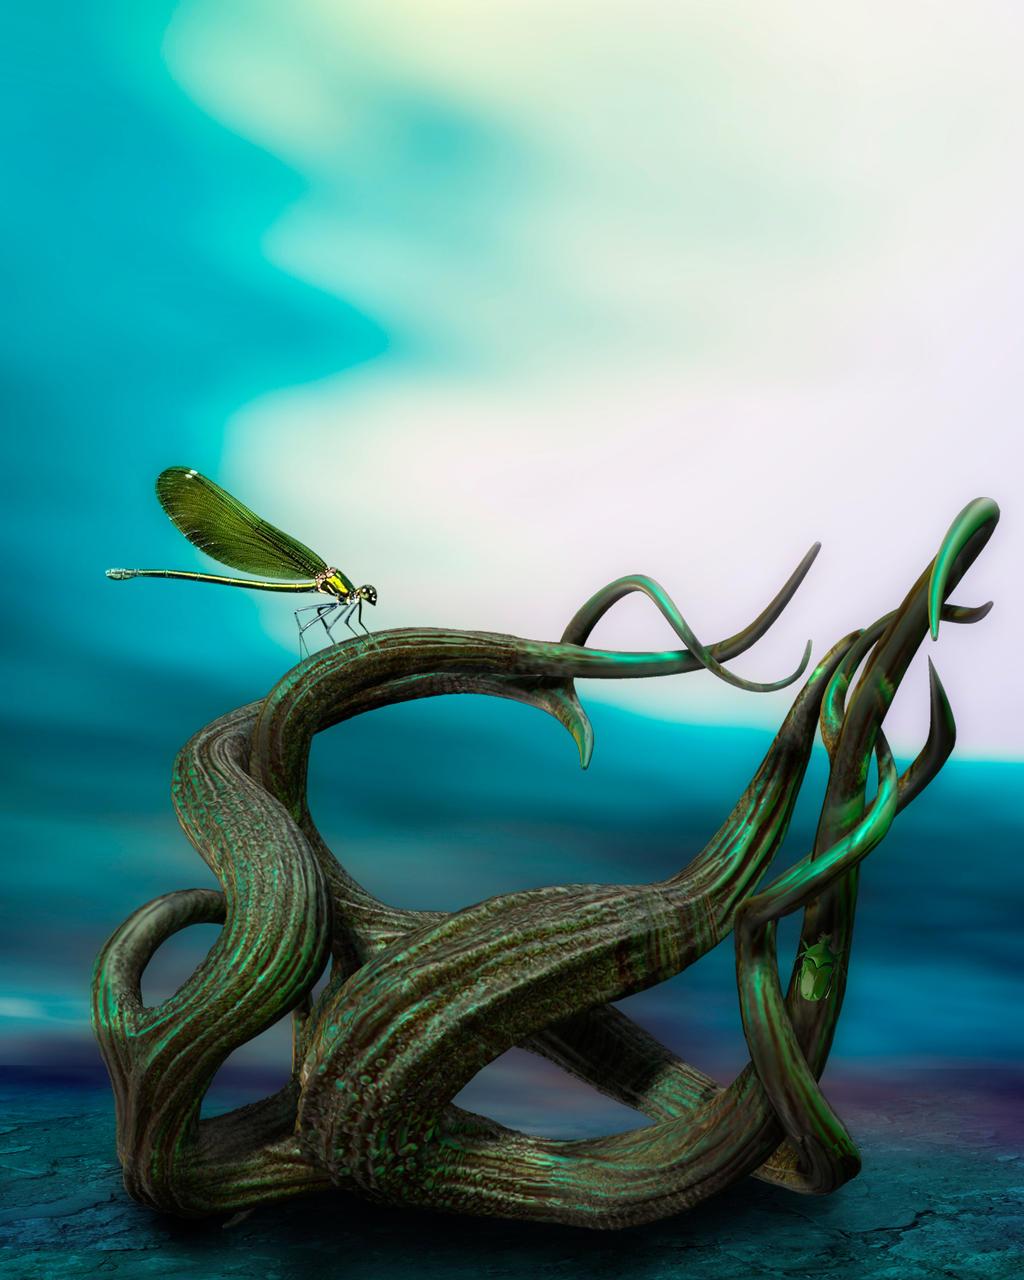 Odd nature background by indigodeep